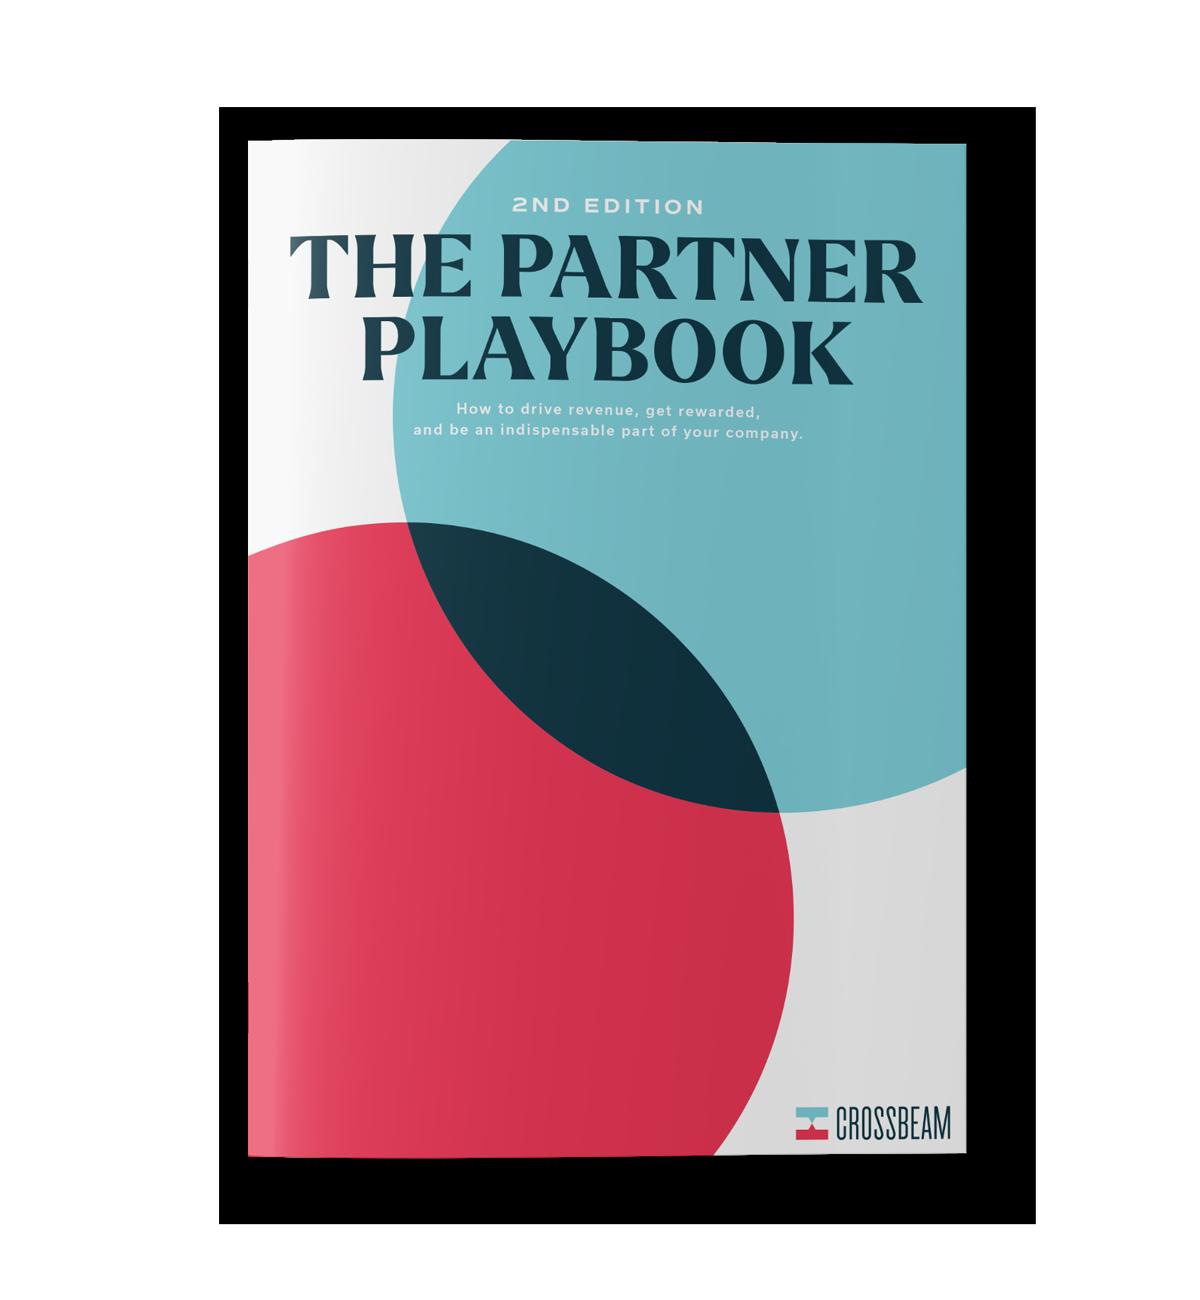 Partner Playbook